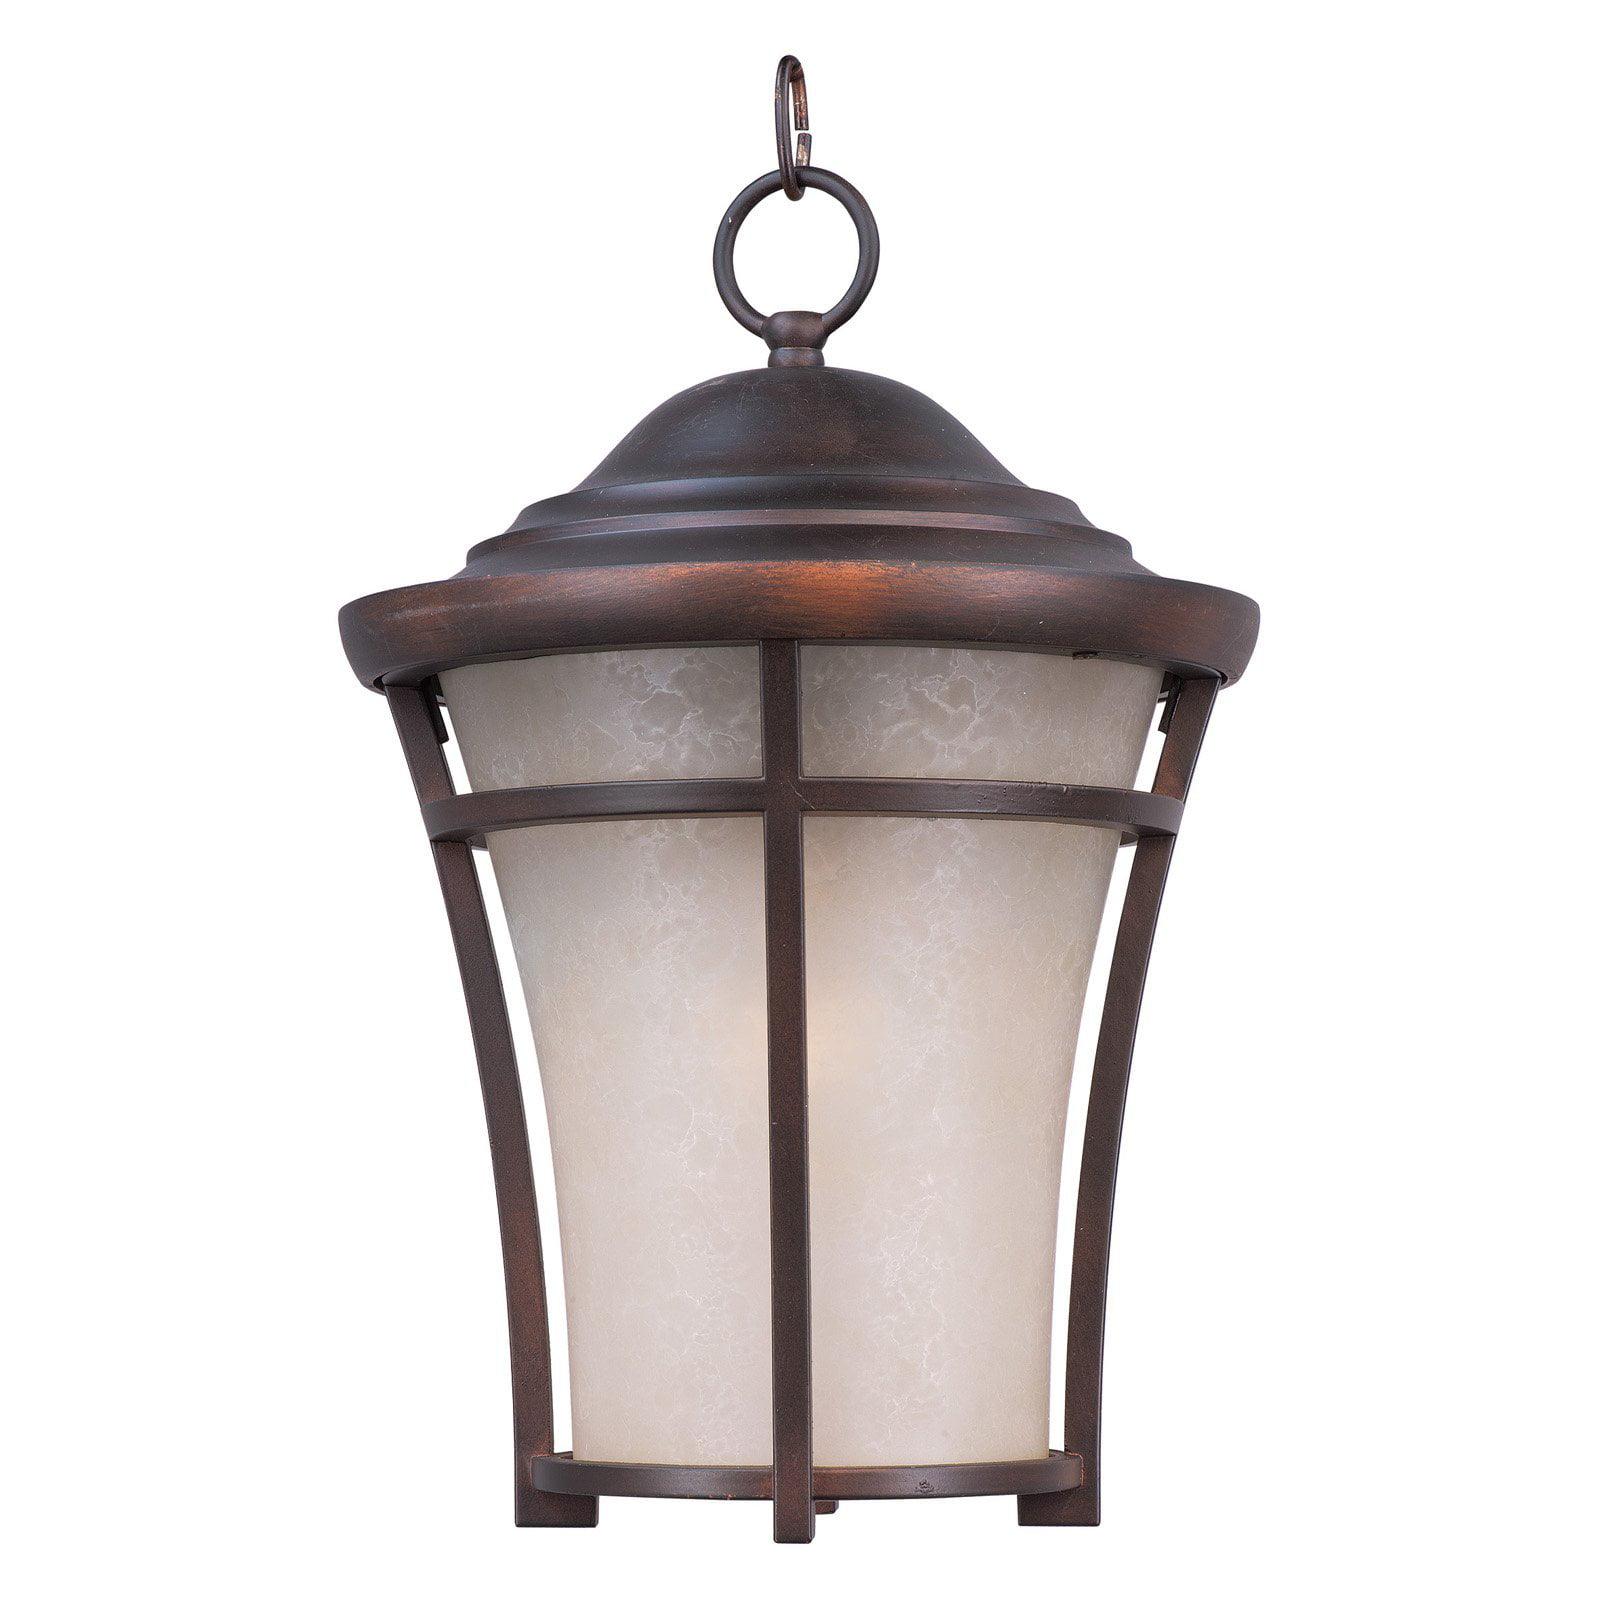 Maxim Balboa DC EE 85509LACO Outdoor Hanging Lantern